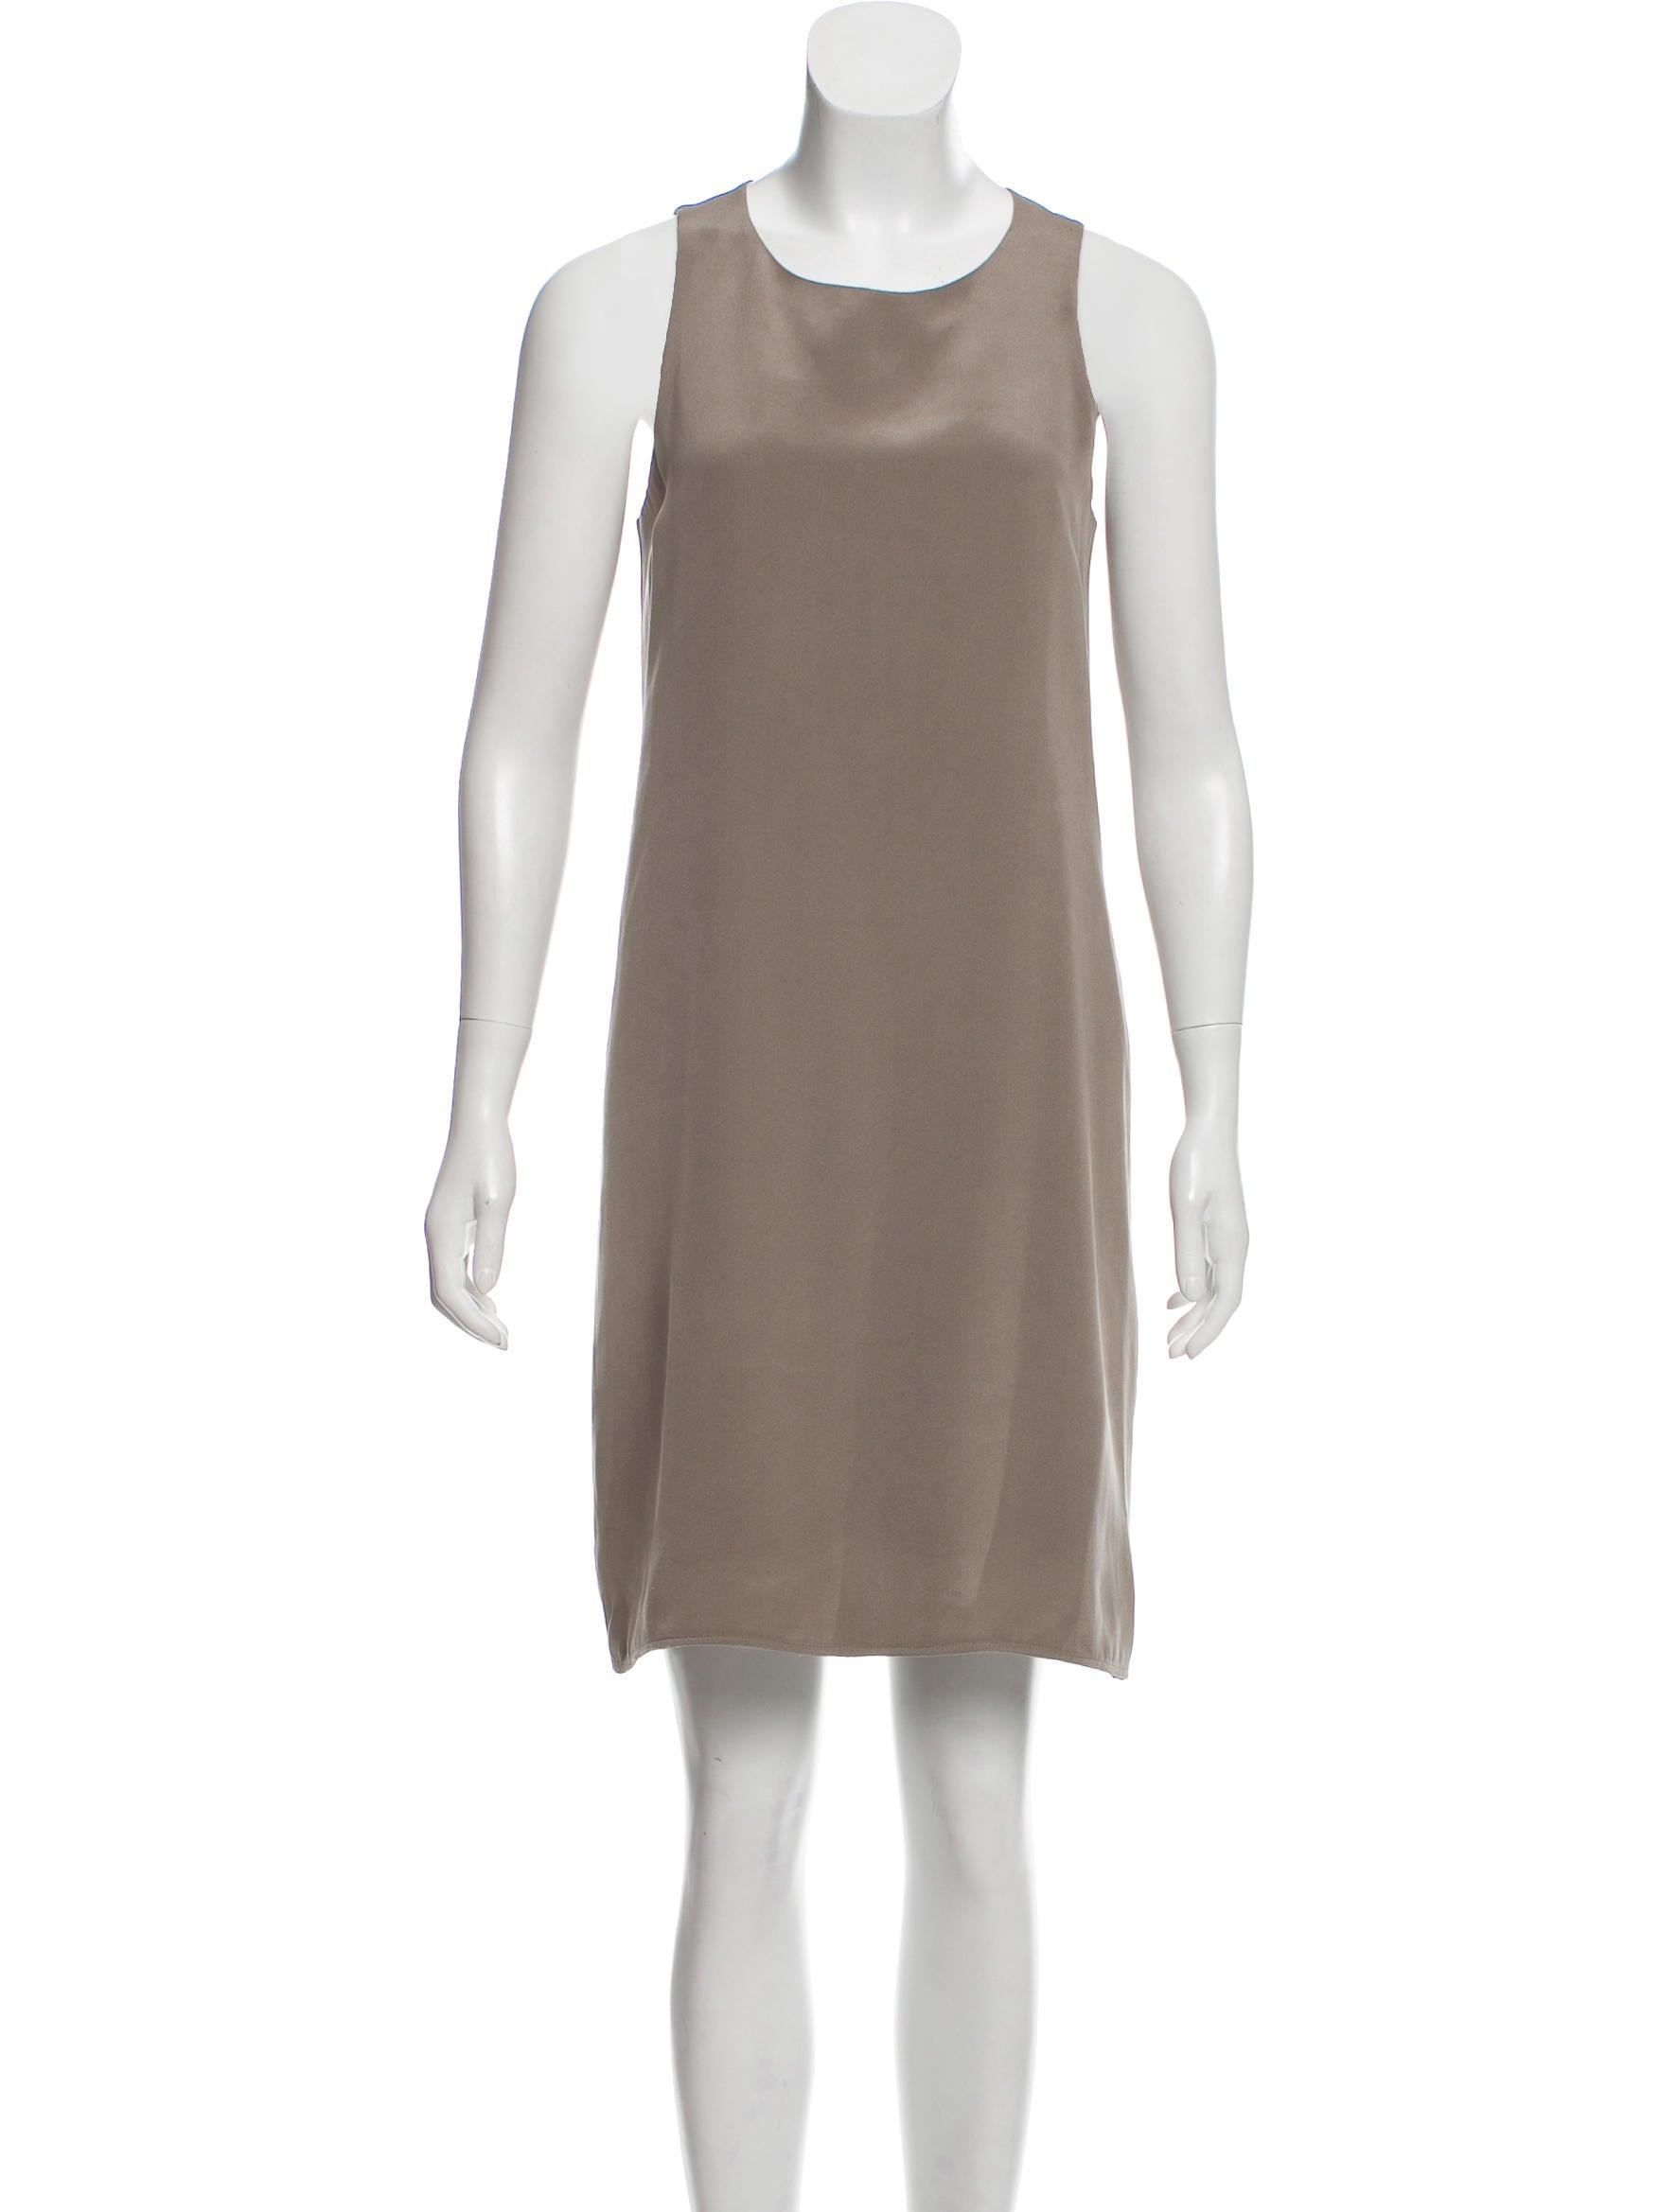 a85603b8b5 Theyskens' Theory Silk Mini Dress - Clothing - WTHYS28468   The RealReal